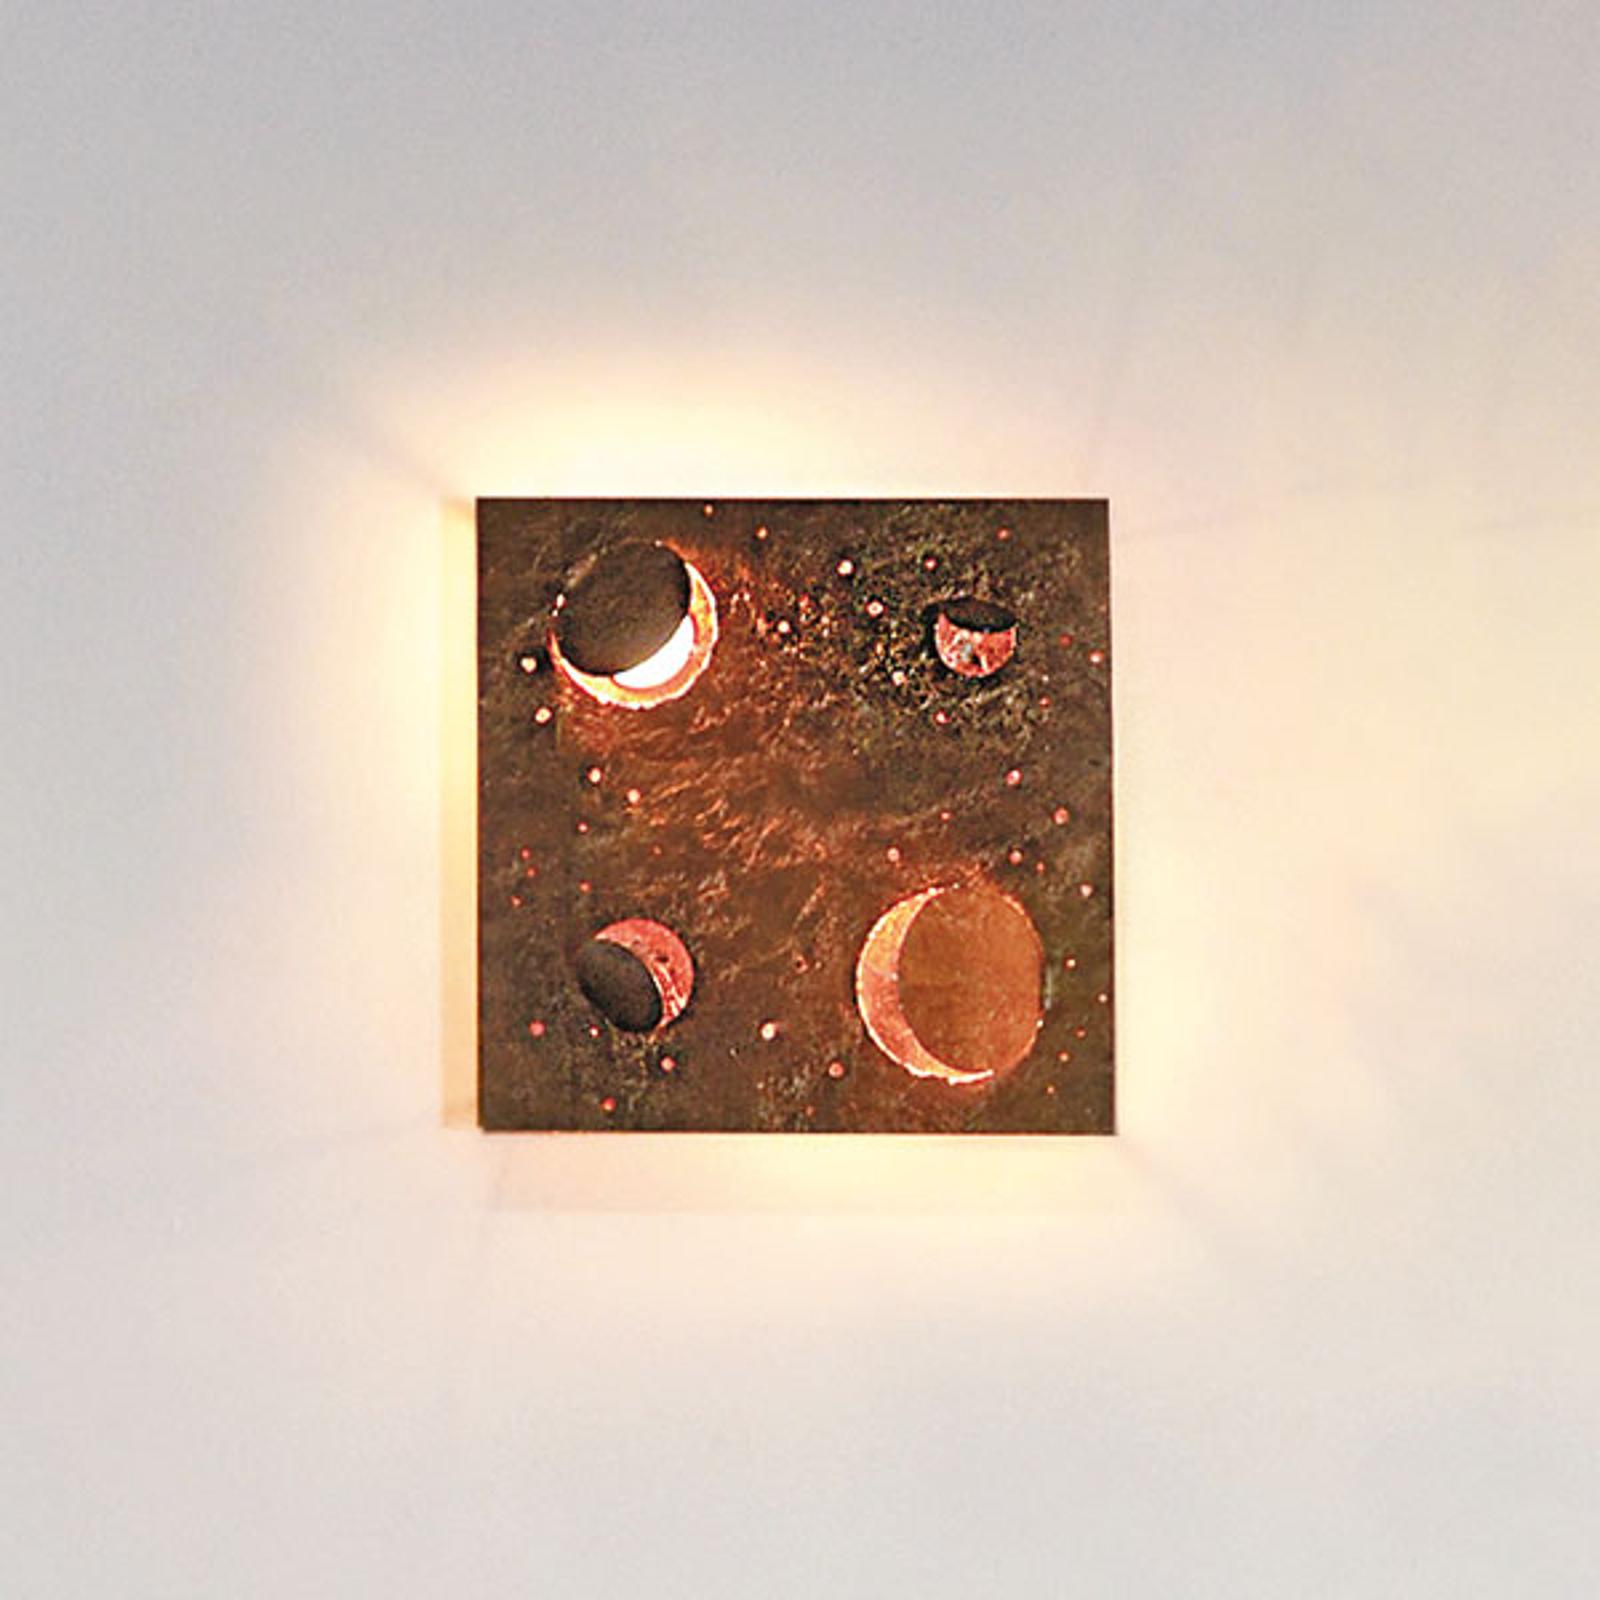 Knikerboker Buchi wandlamp 32x32cm bladkoper